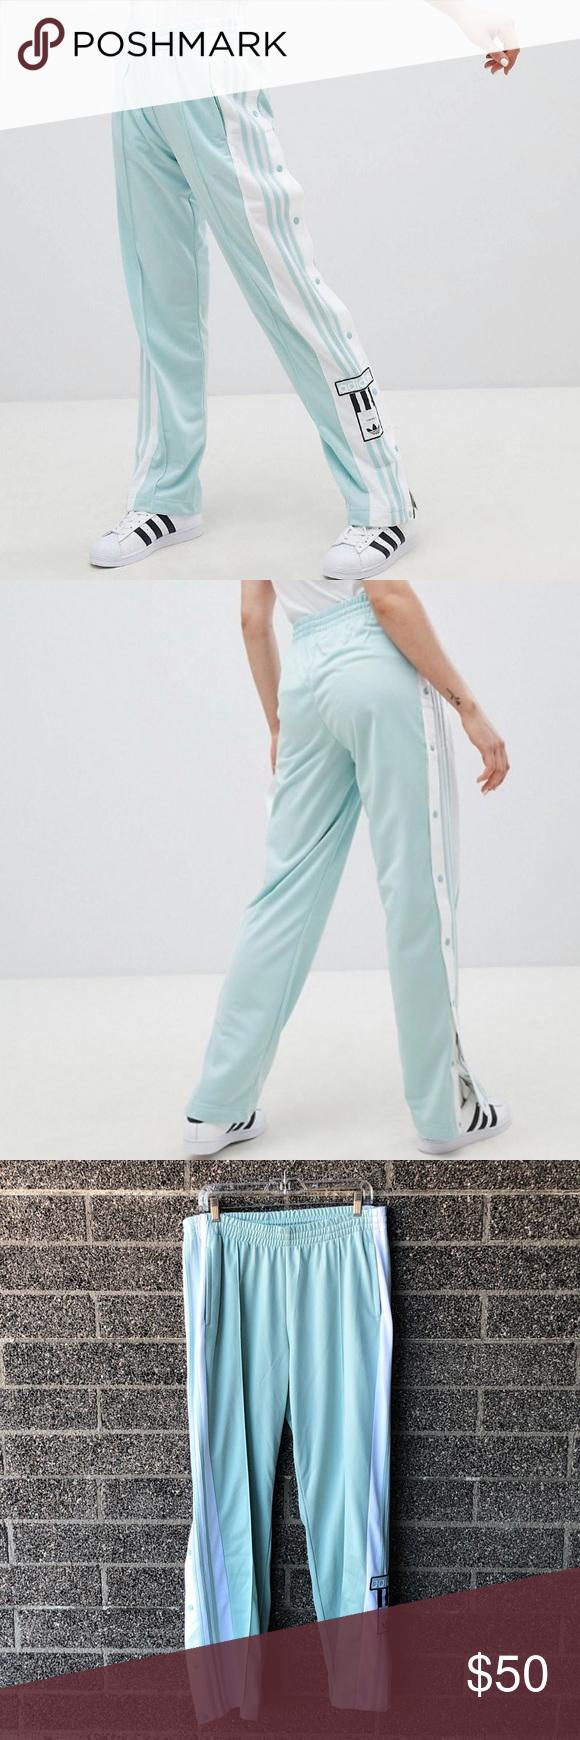 42437319 Adidas Originals adicolor Popper Pants In Mint L Adidas Originals adicolor  Popper Pants In Mint size large. New condition. No longer just a slacker  staple ...